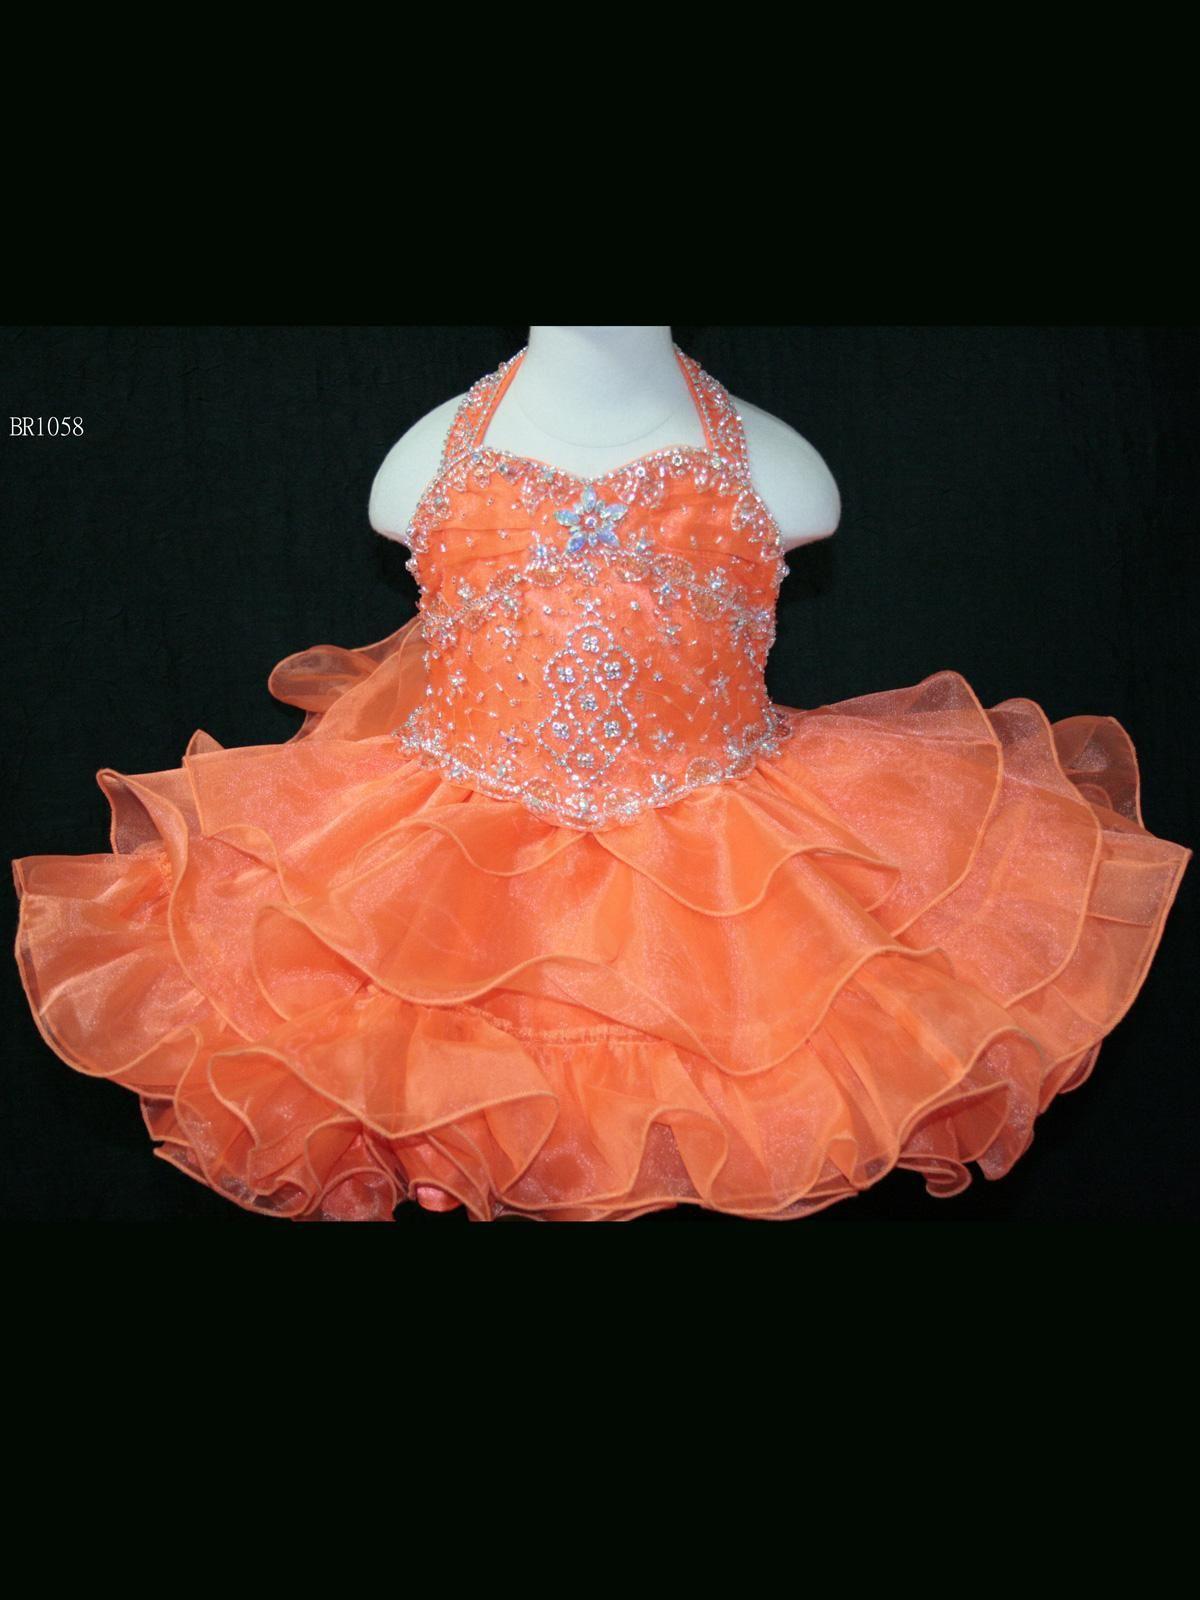 Charming meninas laranja Pageant Vestidos Beading corpete Top volta zipper Meninas Vestidos Tiered Ruffle aniversário vestidos de festa